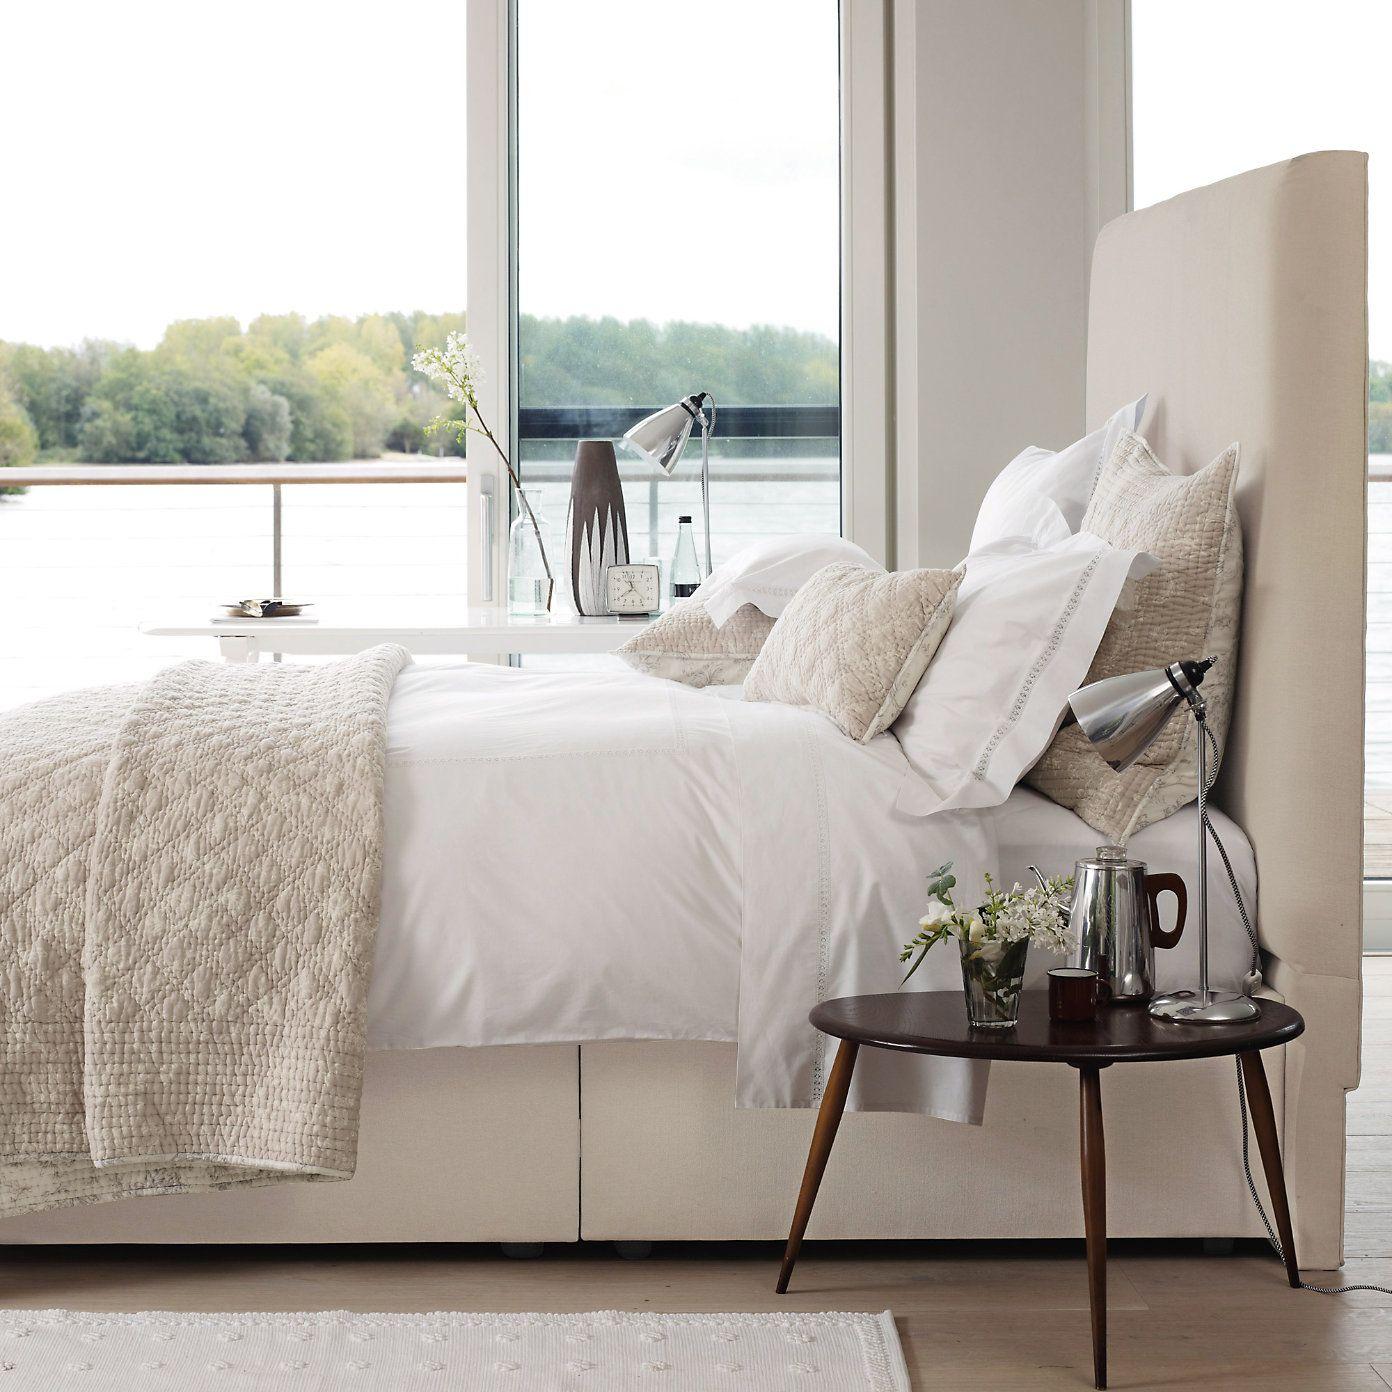 High fabric headboard cream neutral bedroom